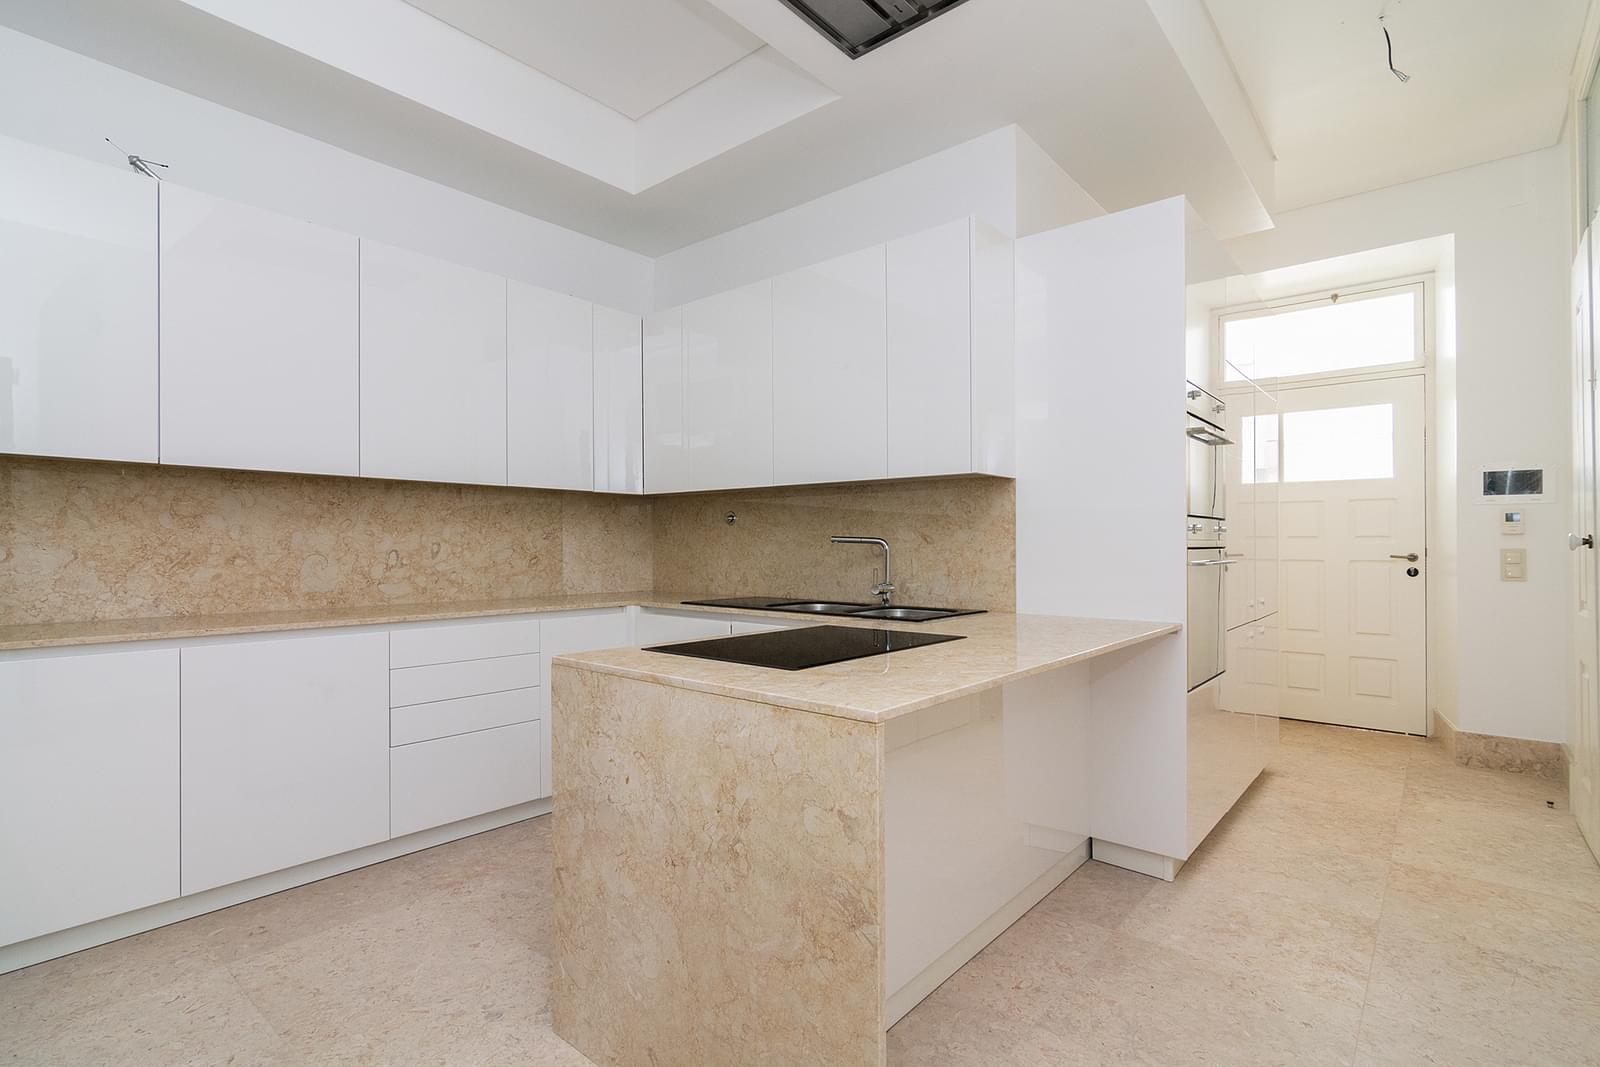 pf16887-apartamento-t5-lisboa-9d01de7f-344b-4f3d-a544-c552b1dc2e06